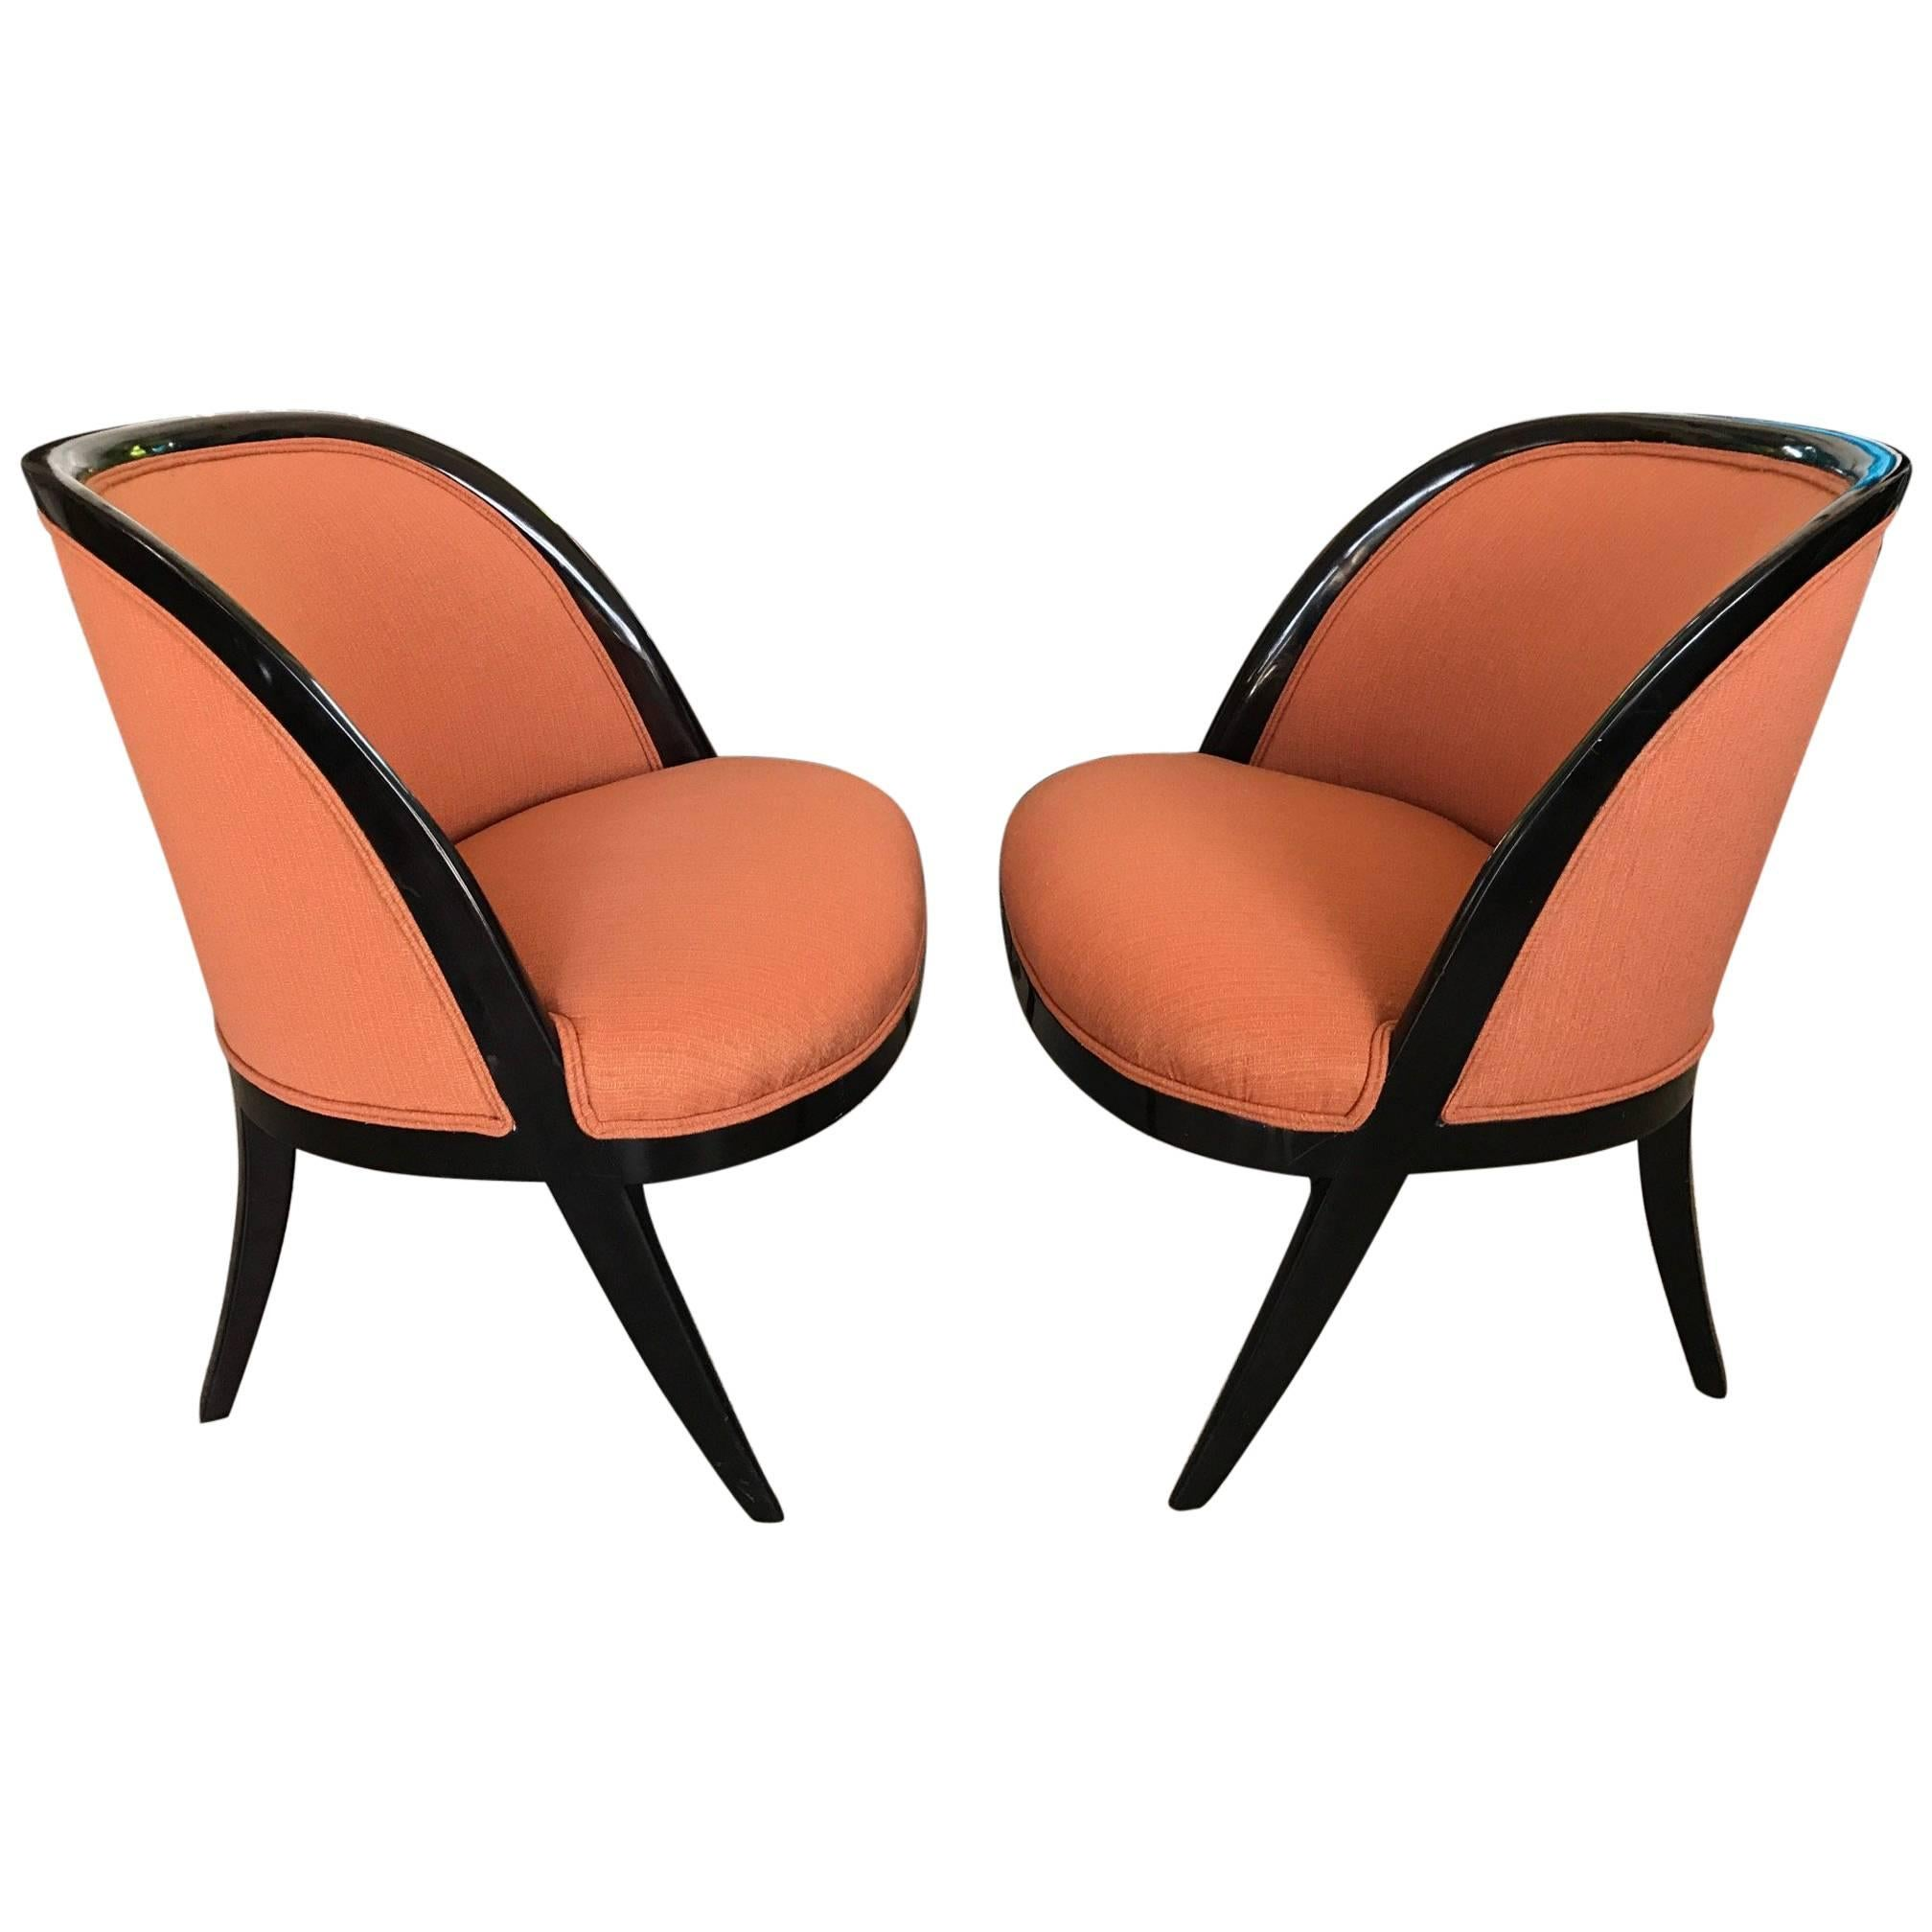 Pair of Elegant Harvey Probber Style Slipper Chairs